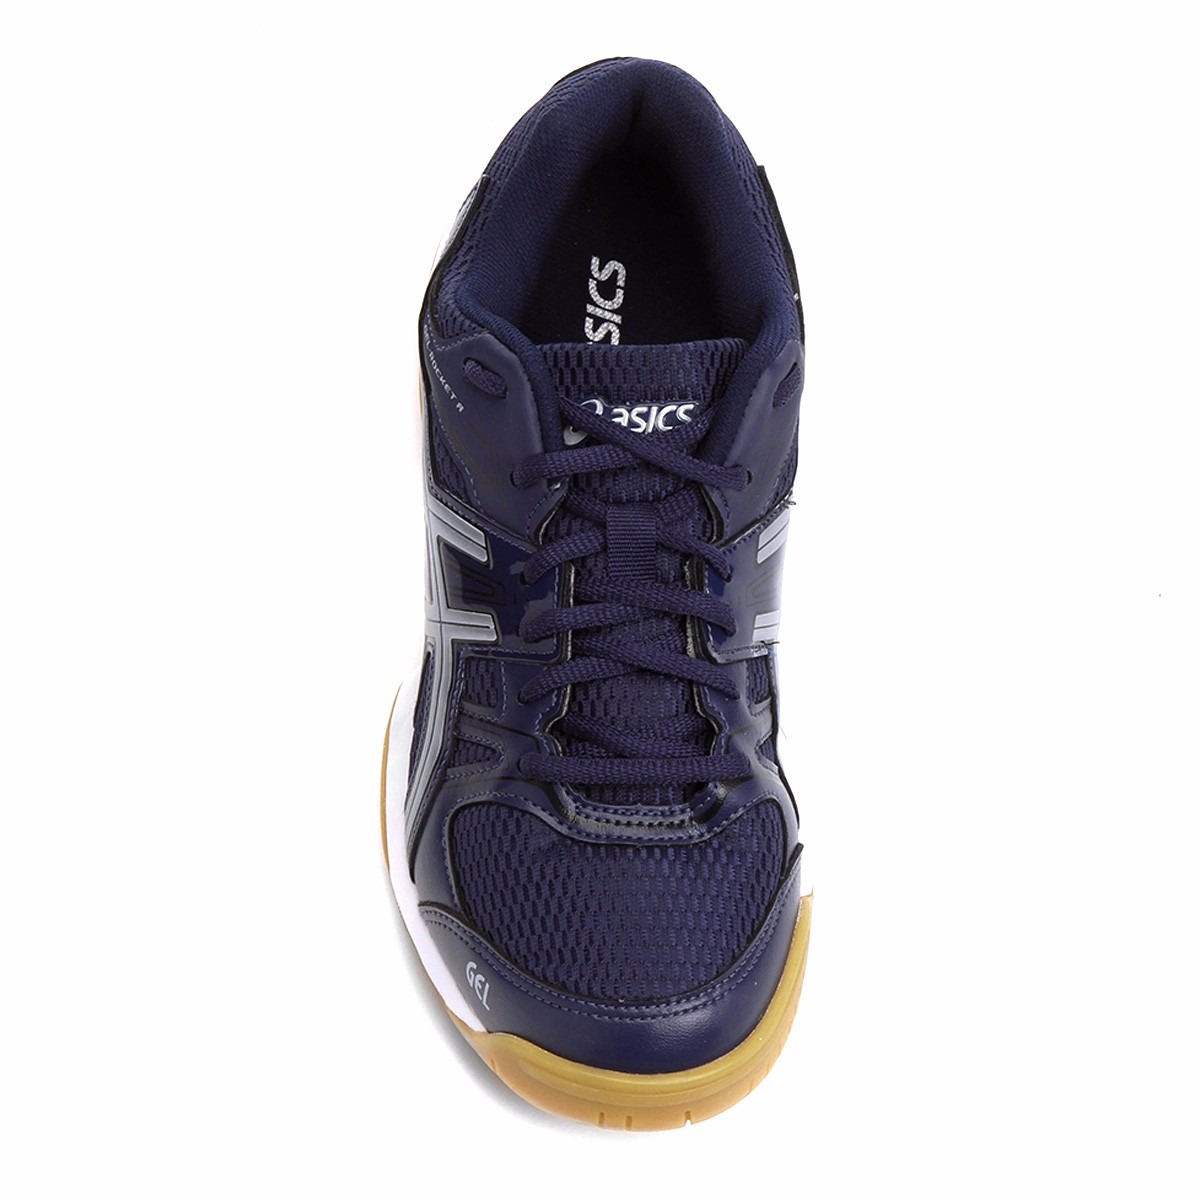 tênis asics gel rocket 7a - futsal   handebol   voleibol. Carregando zoom. 6034e6beb6190